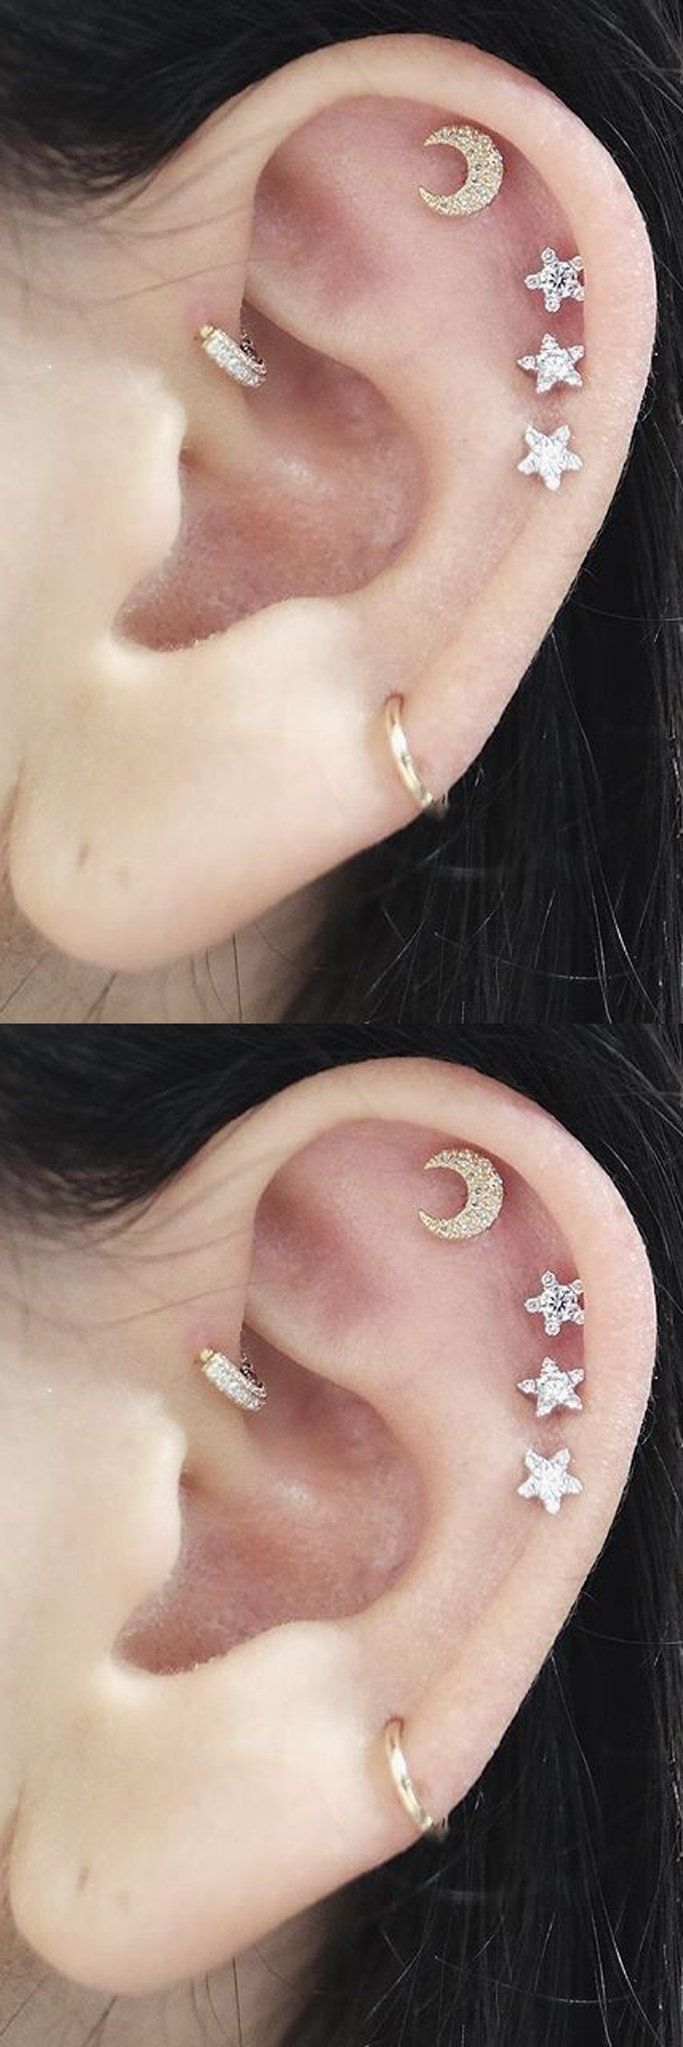 19f021fc6 Cute Feminine Multiple Ear Piercing Combination Ideas at MyBodiArt.com - Crescent  Moon and Stars Sky Cartilage Helix Earring Studs